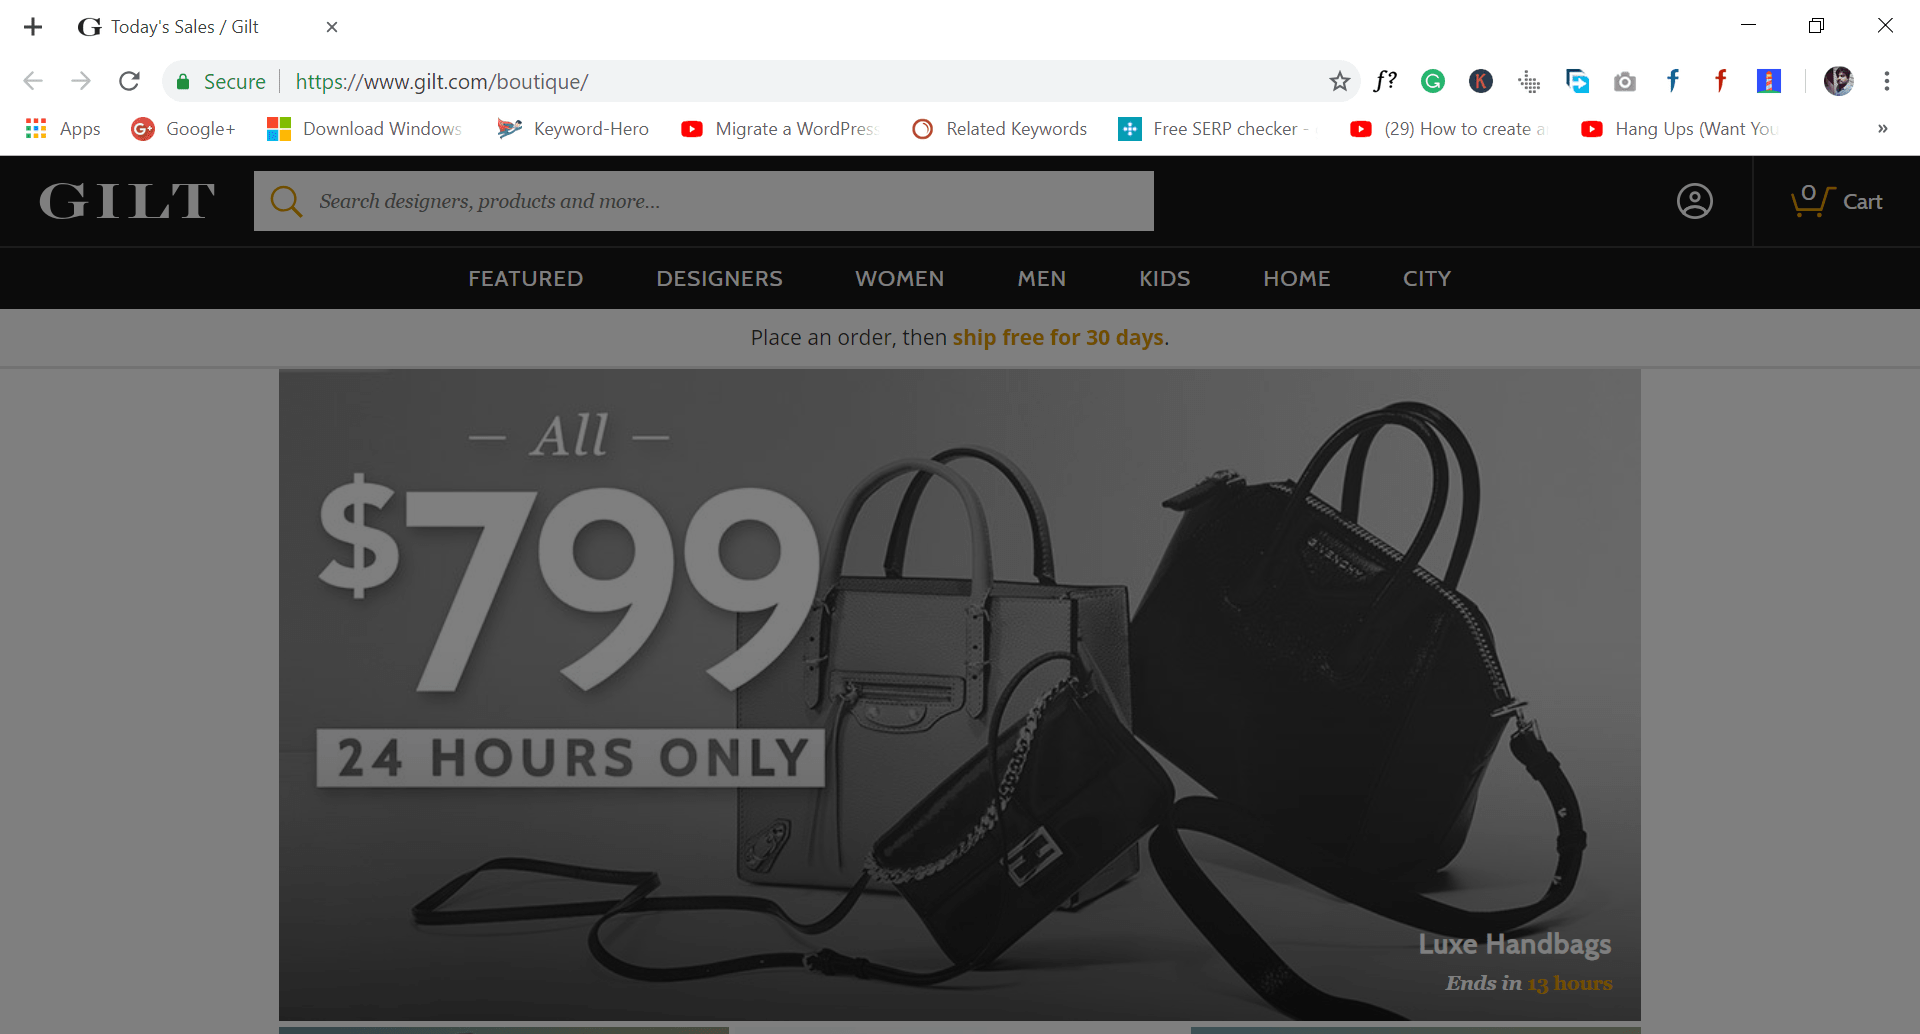 gilt - site like wish.com